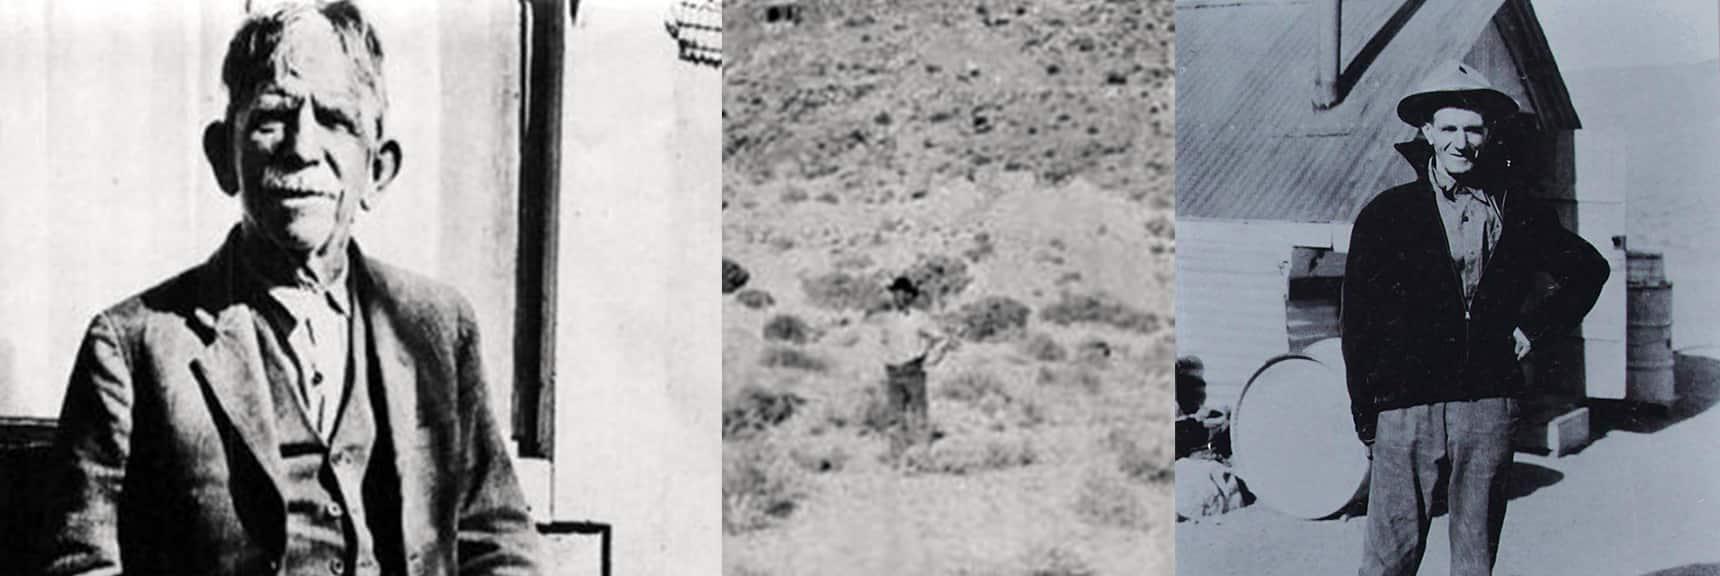 Shorty Harris & Pete Aguereberry | Harrisburg | Aguereberry Point Death Valley California